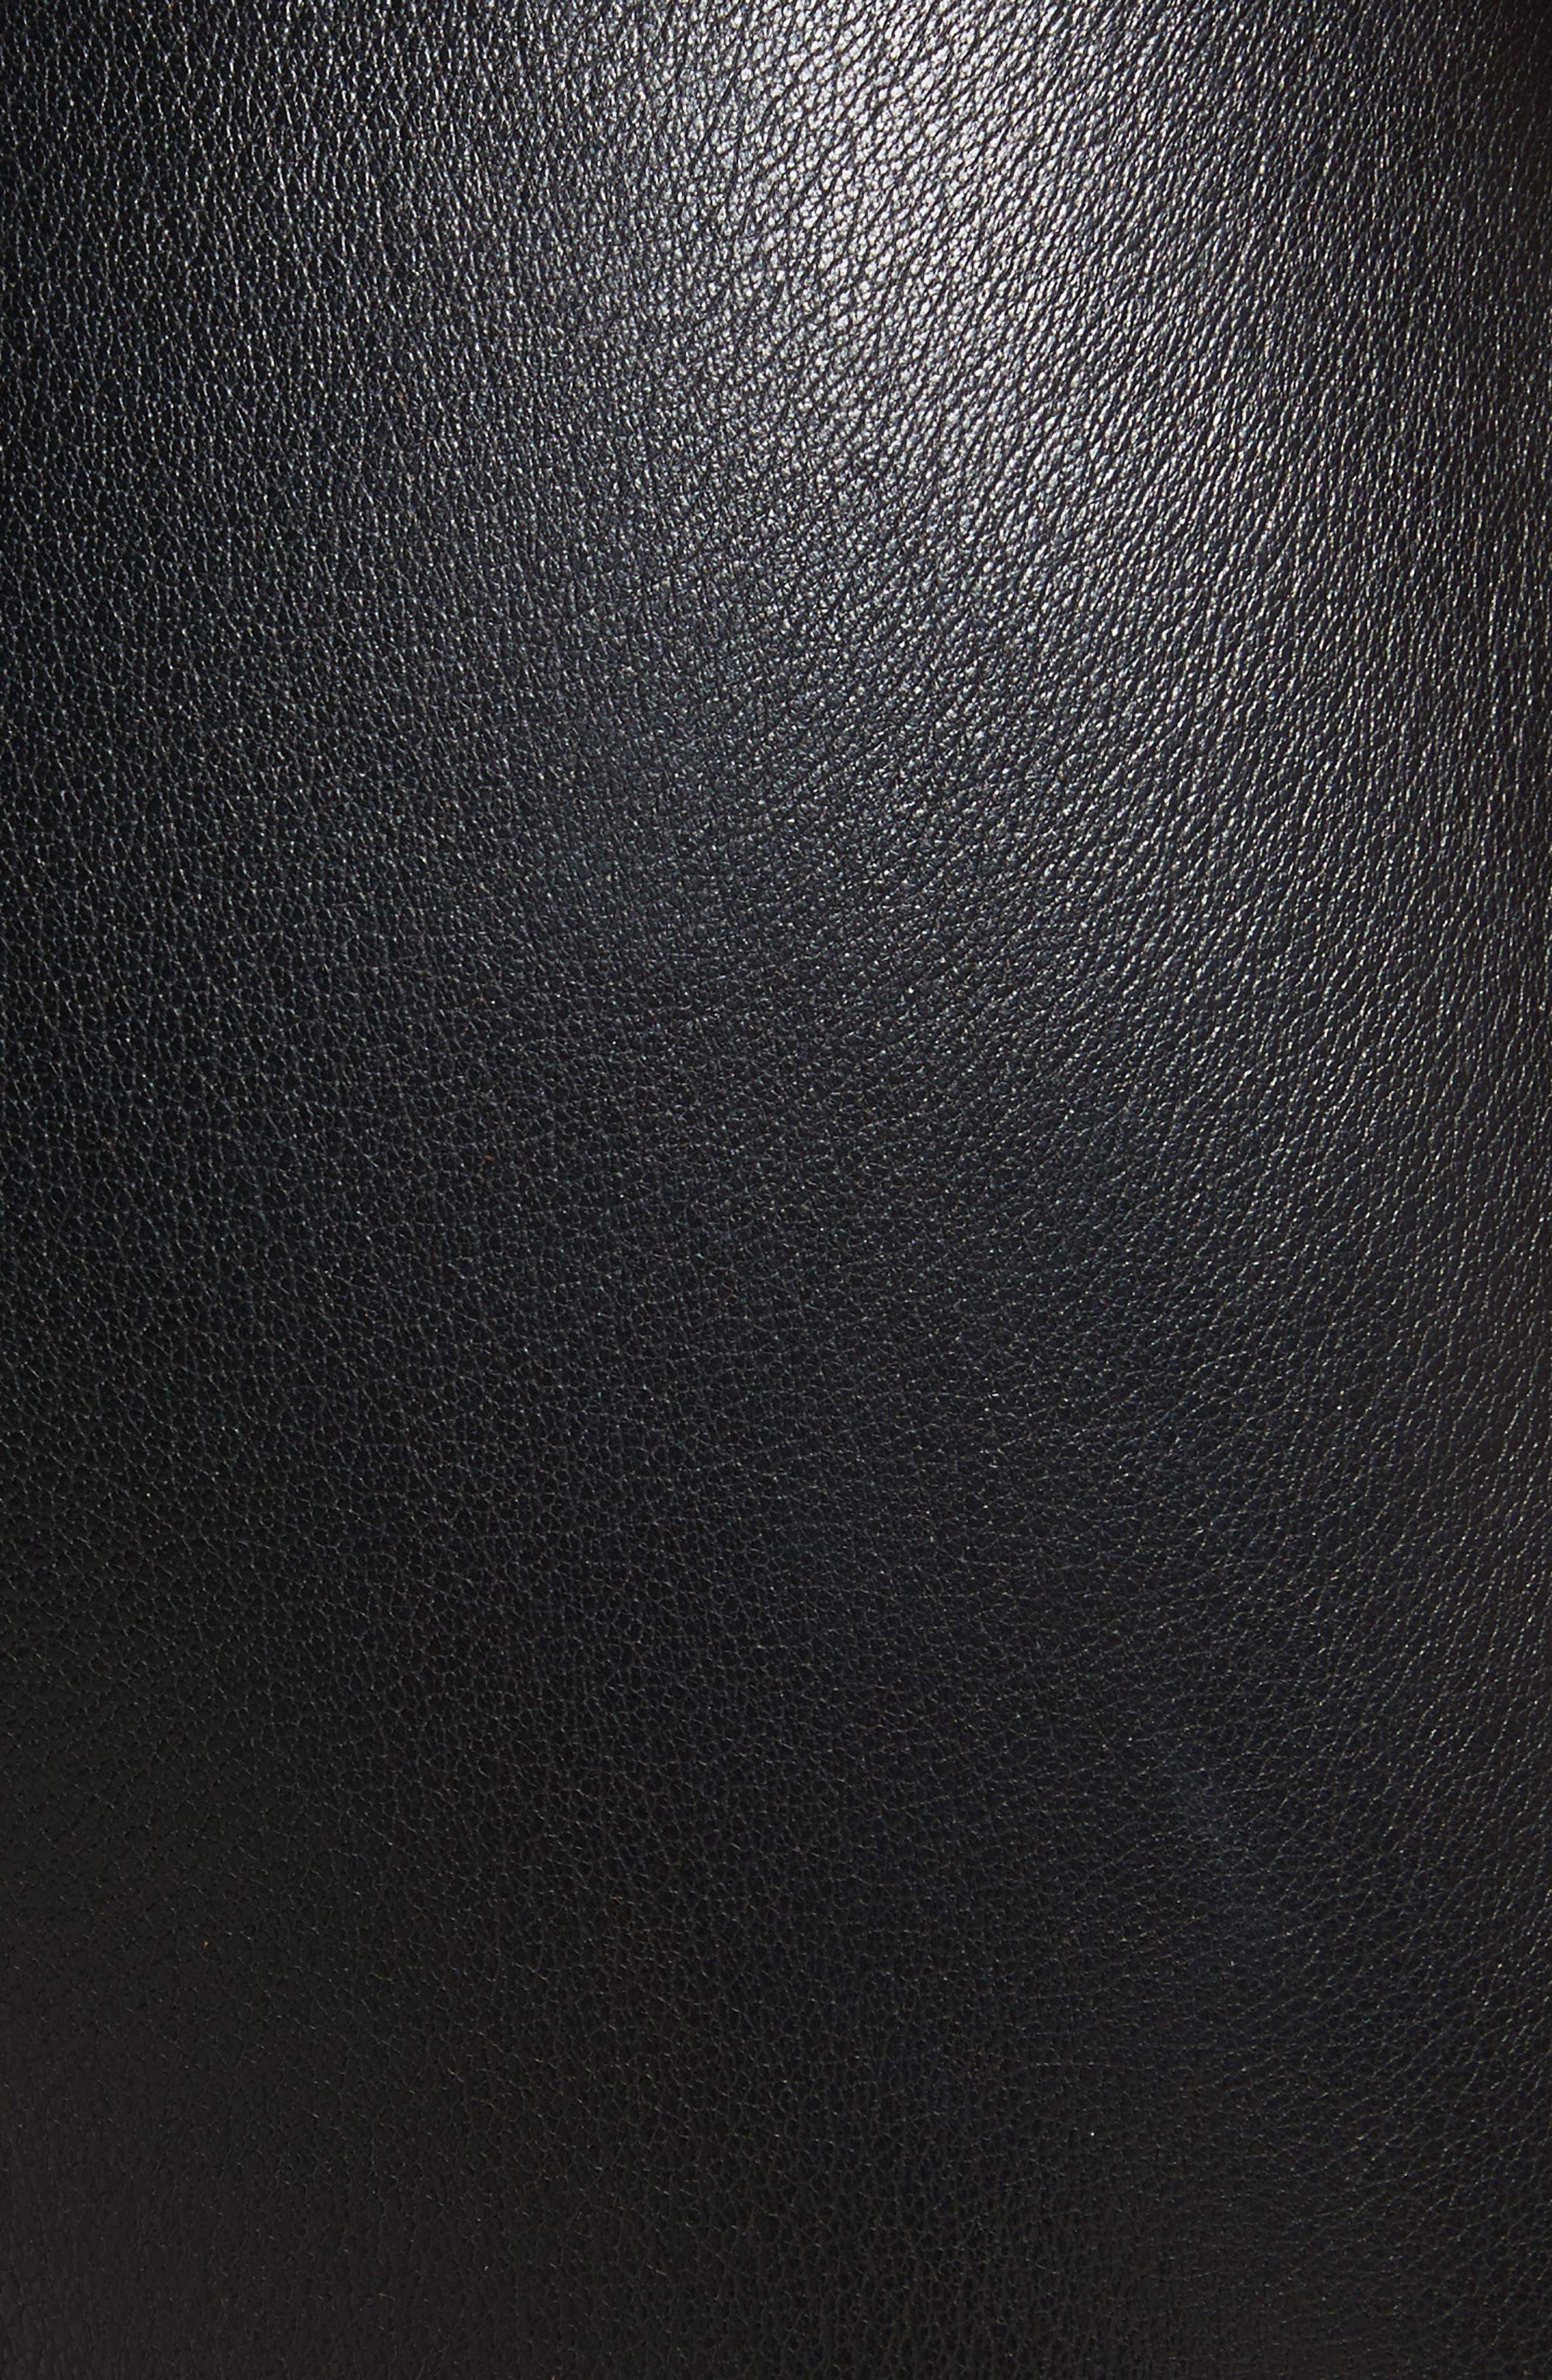 Gionata Ruffle Hem Leather Pants,                             Alternate thumbnail 5, color,